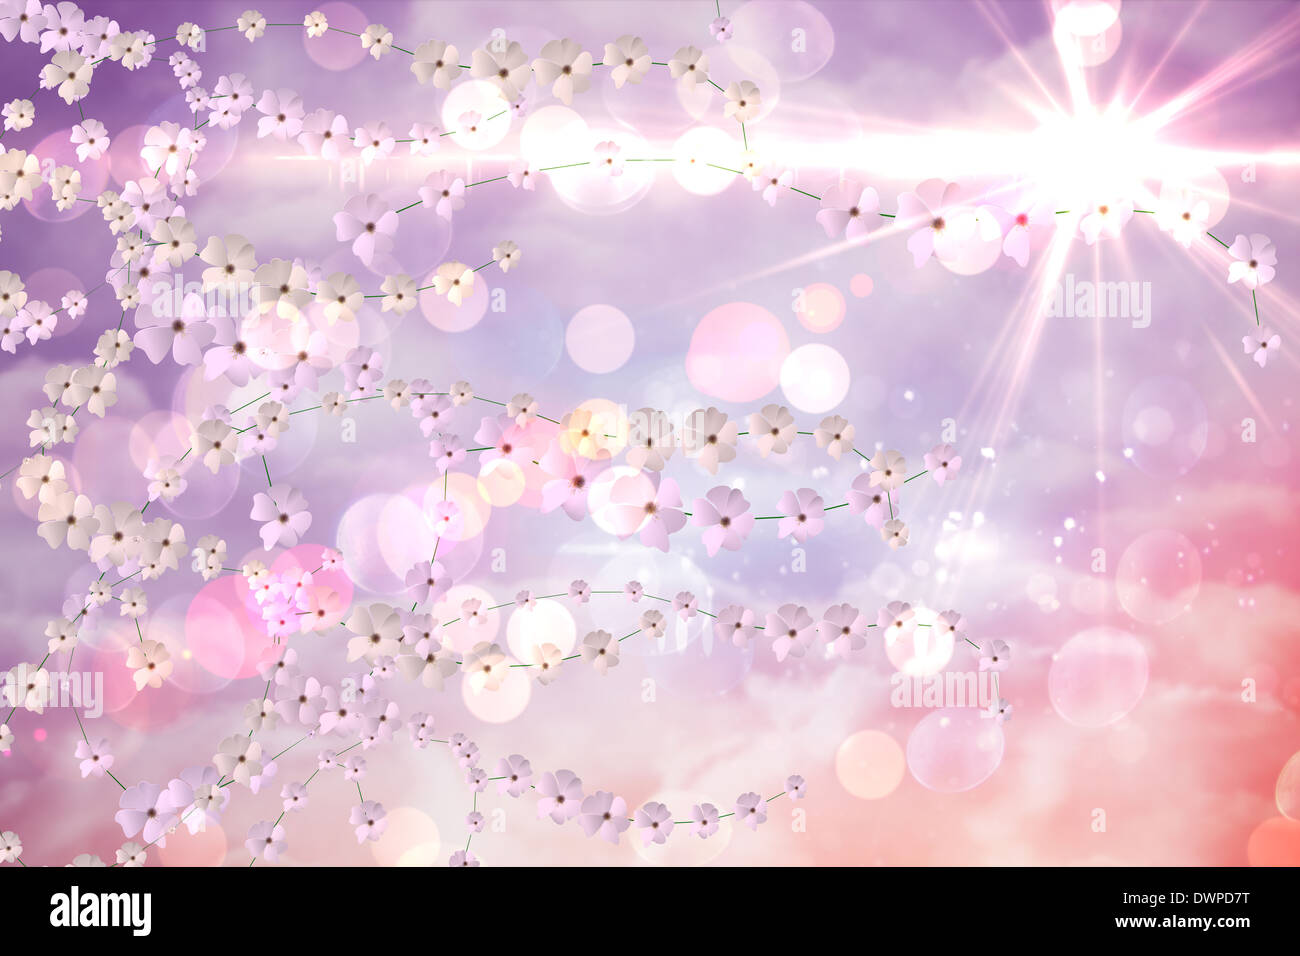 Digitally generated flower background - Stock Image